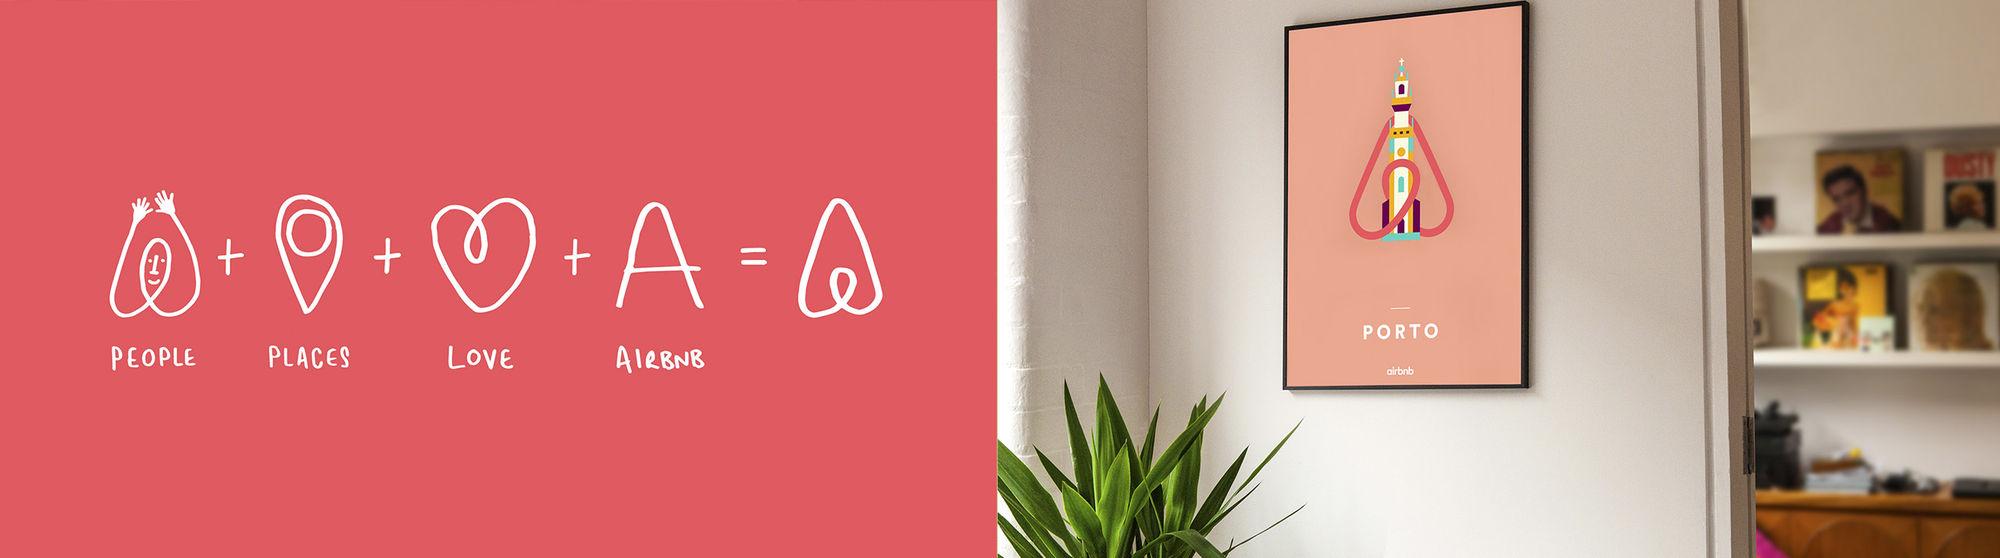 Evoluzione logo Airbnb